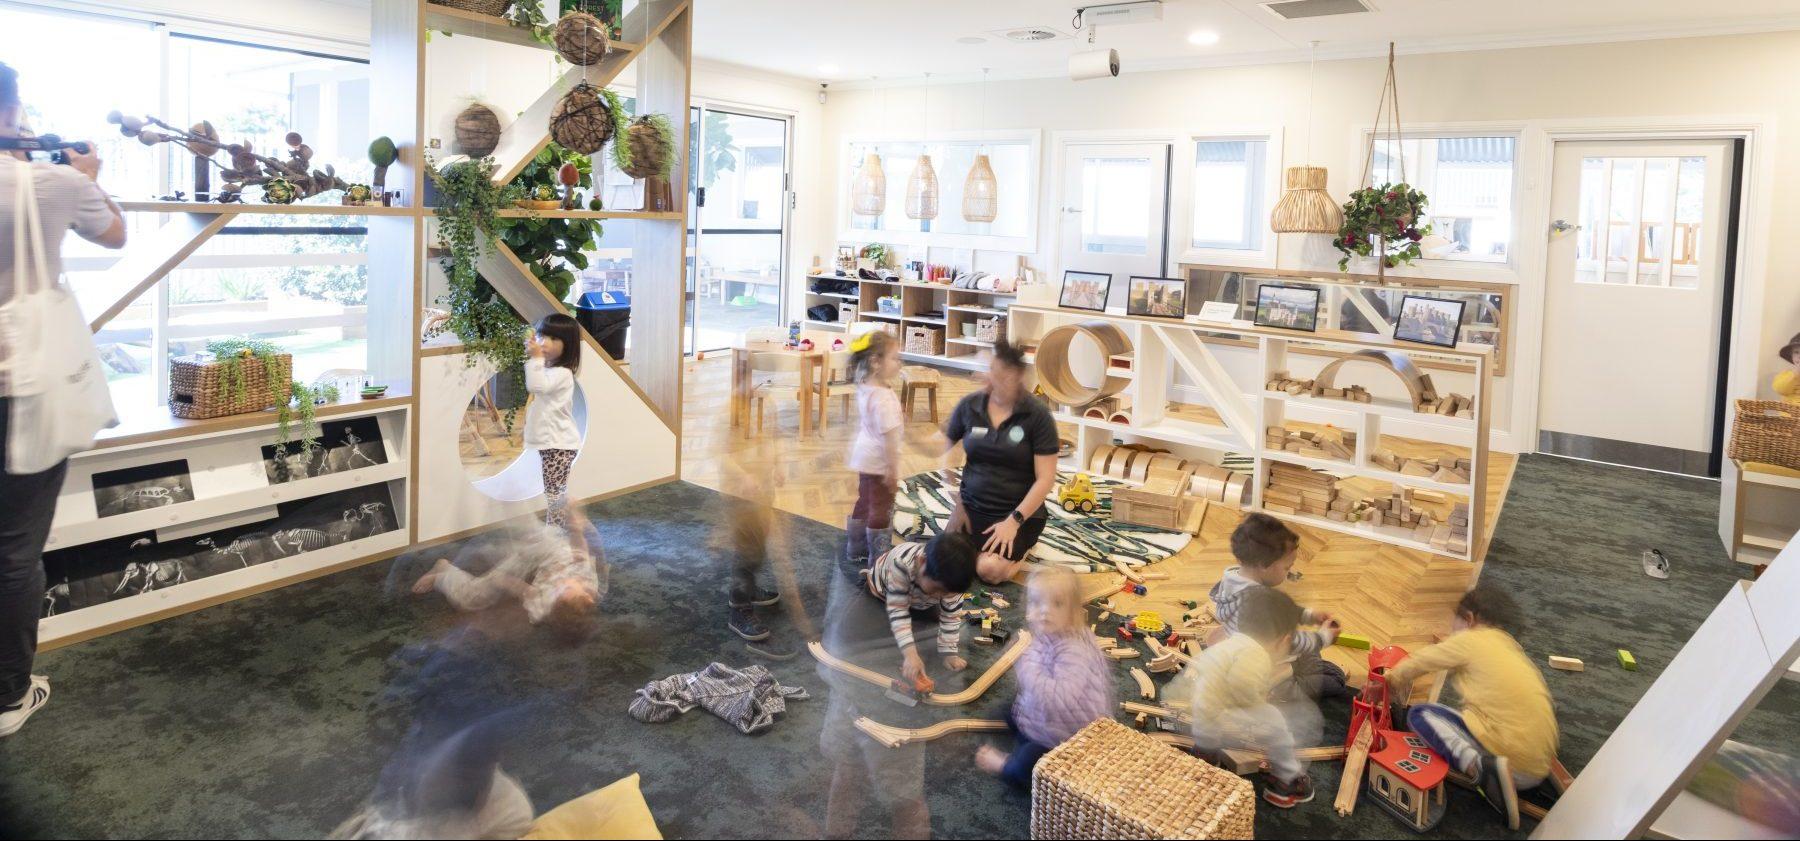 Donaldson Street Childcare Int Playroom